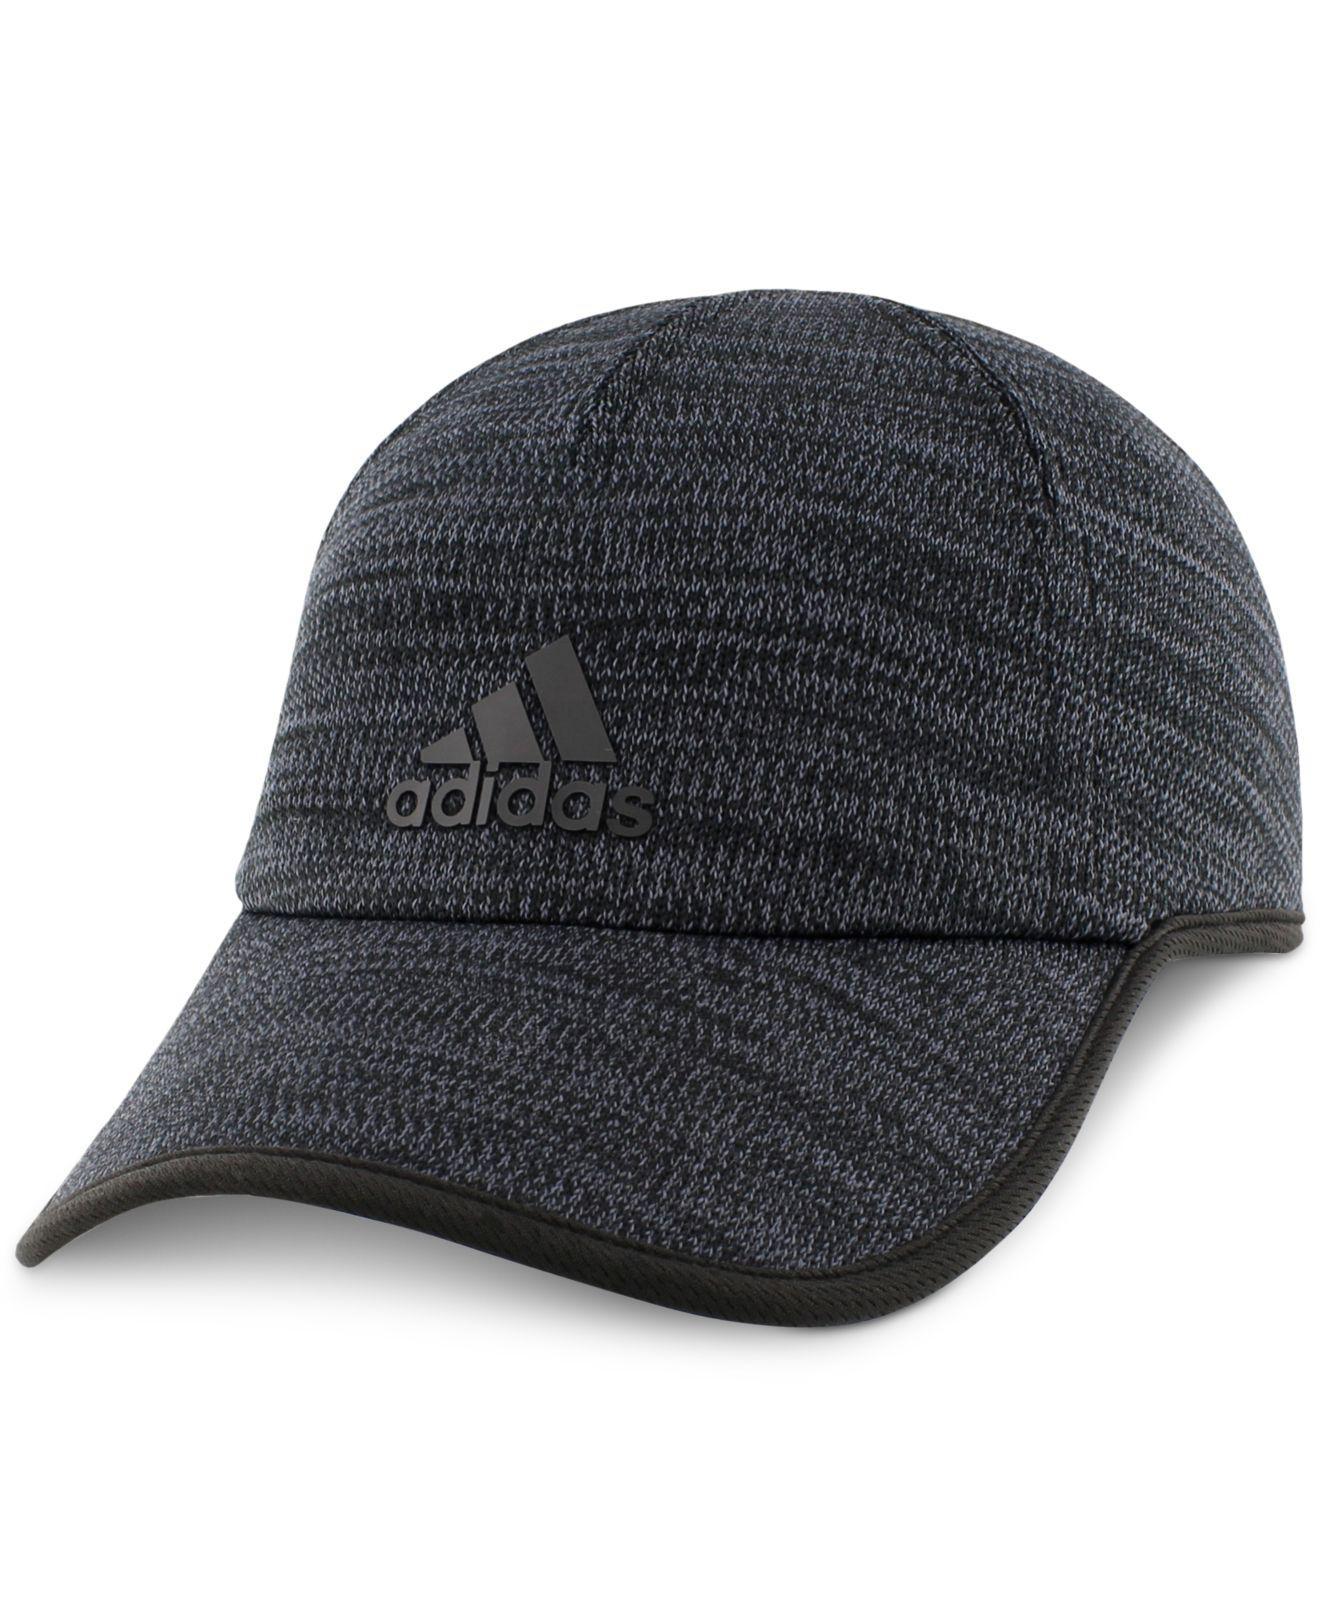 df1985efde7 Adidas - Black Superlite Climalite® Cap for Men - Lyst. View fullscreen